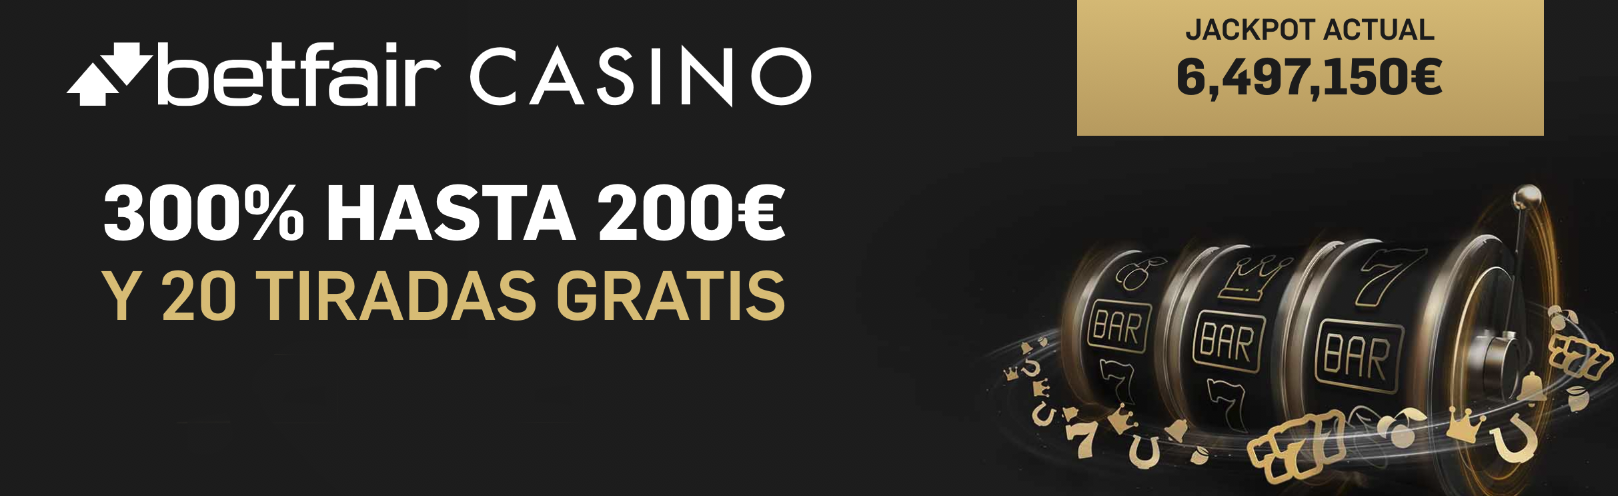 betfair casino bonos